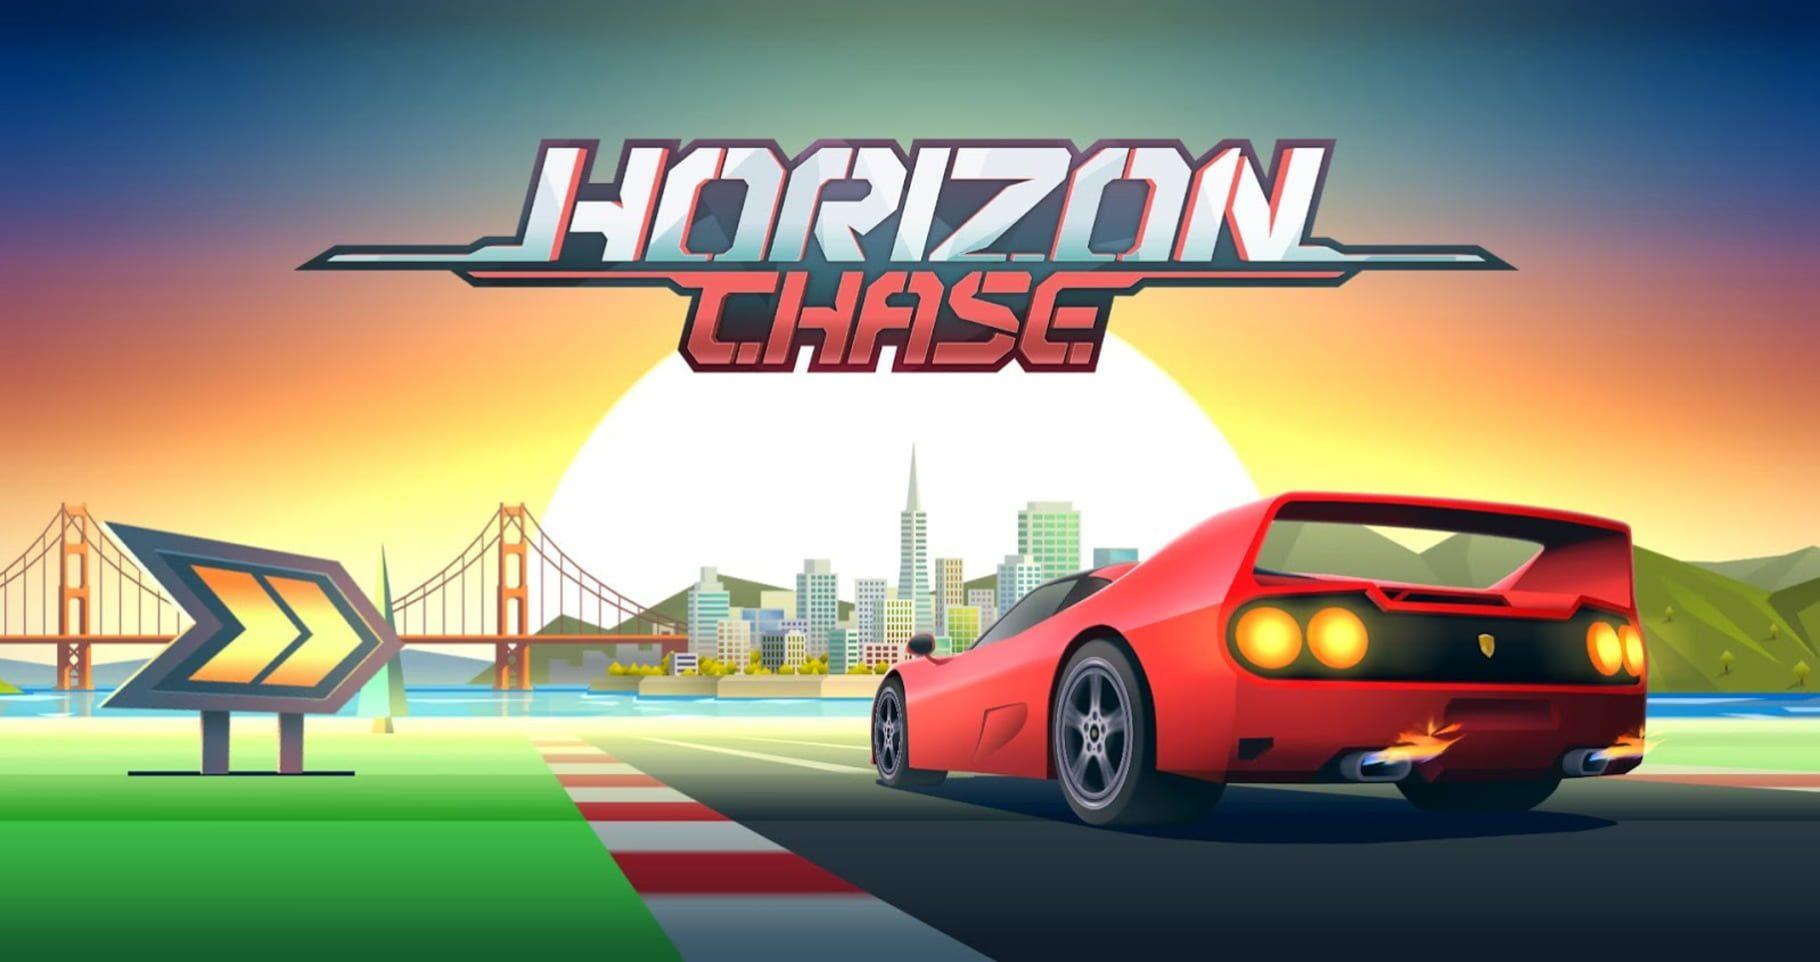 buy Horizon Chase cd key for all platform